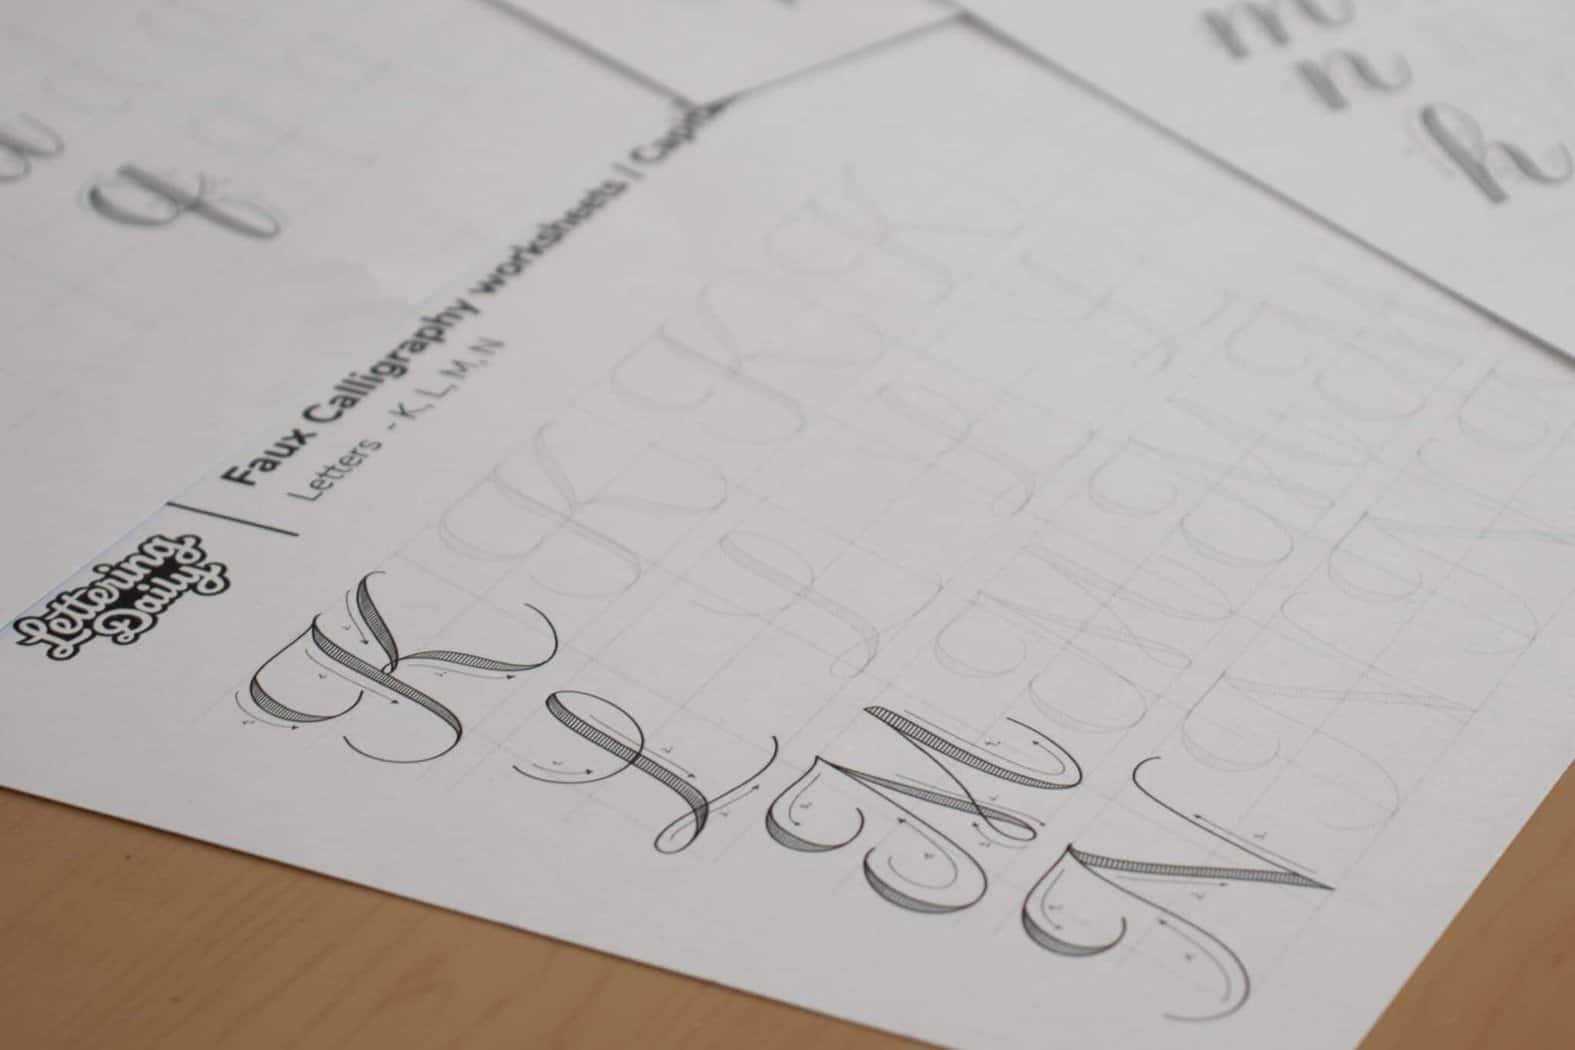 Improved brush pen image (3 of 3)